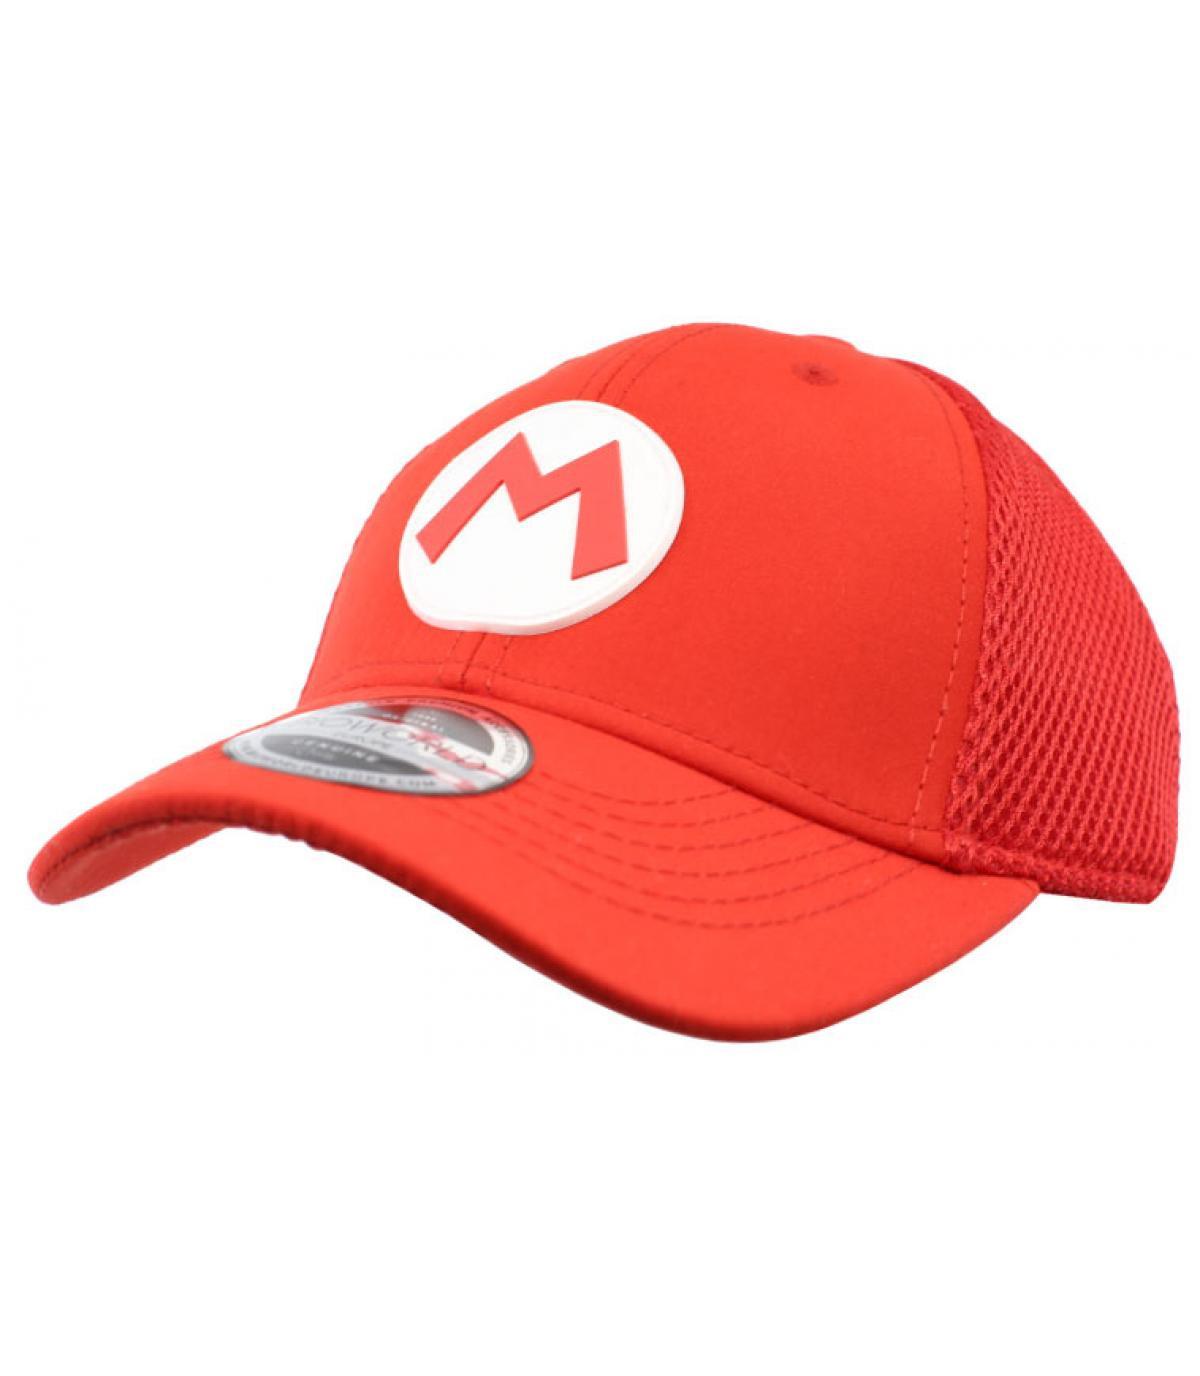 Dettagli Trucker Mario kids - image 2